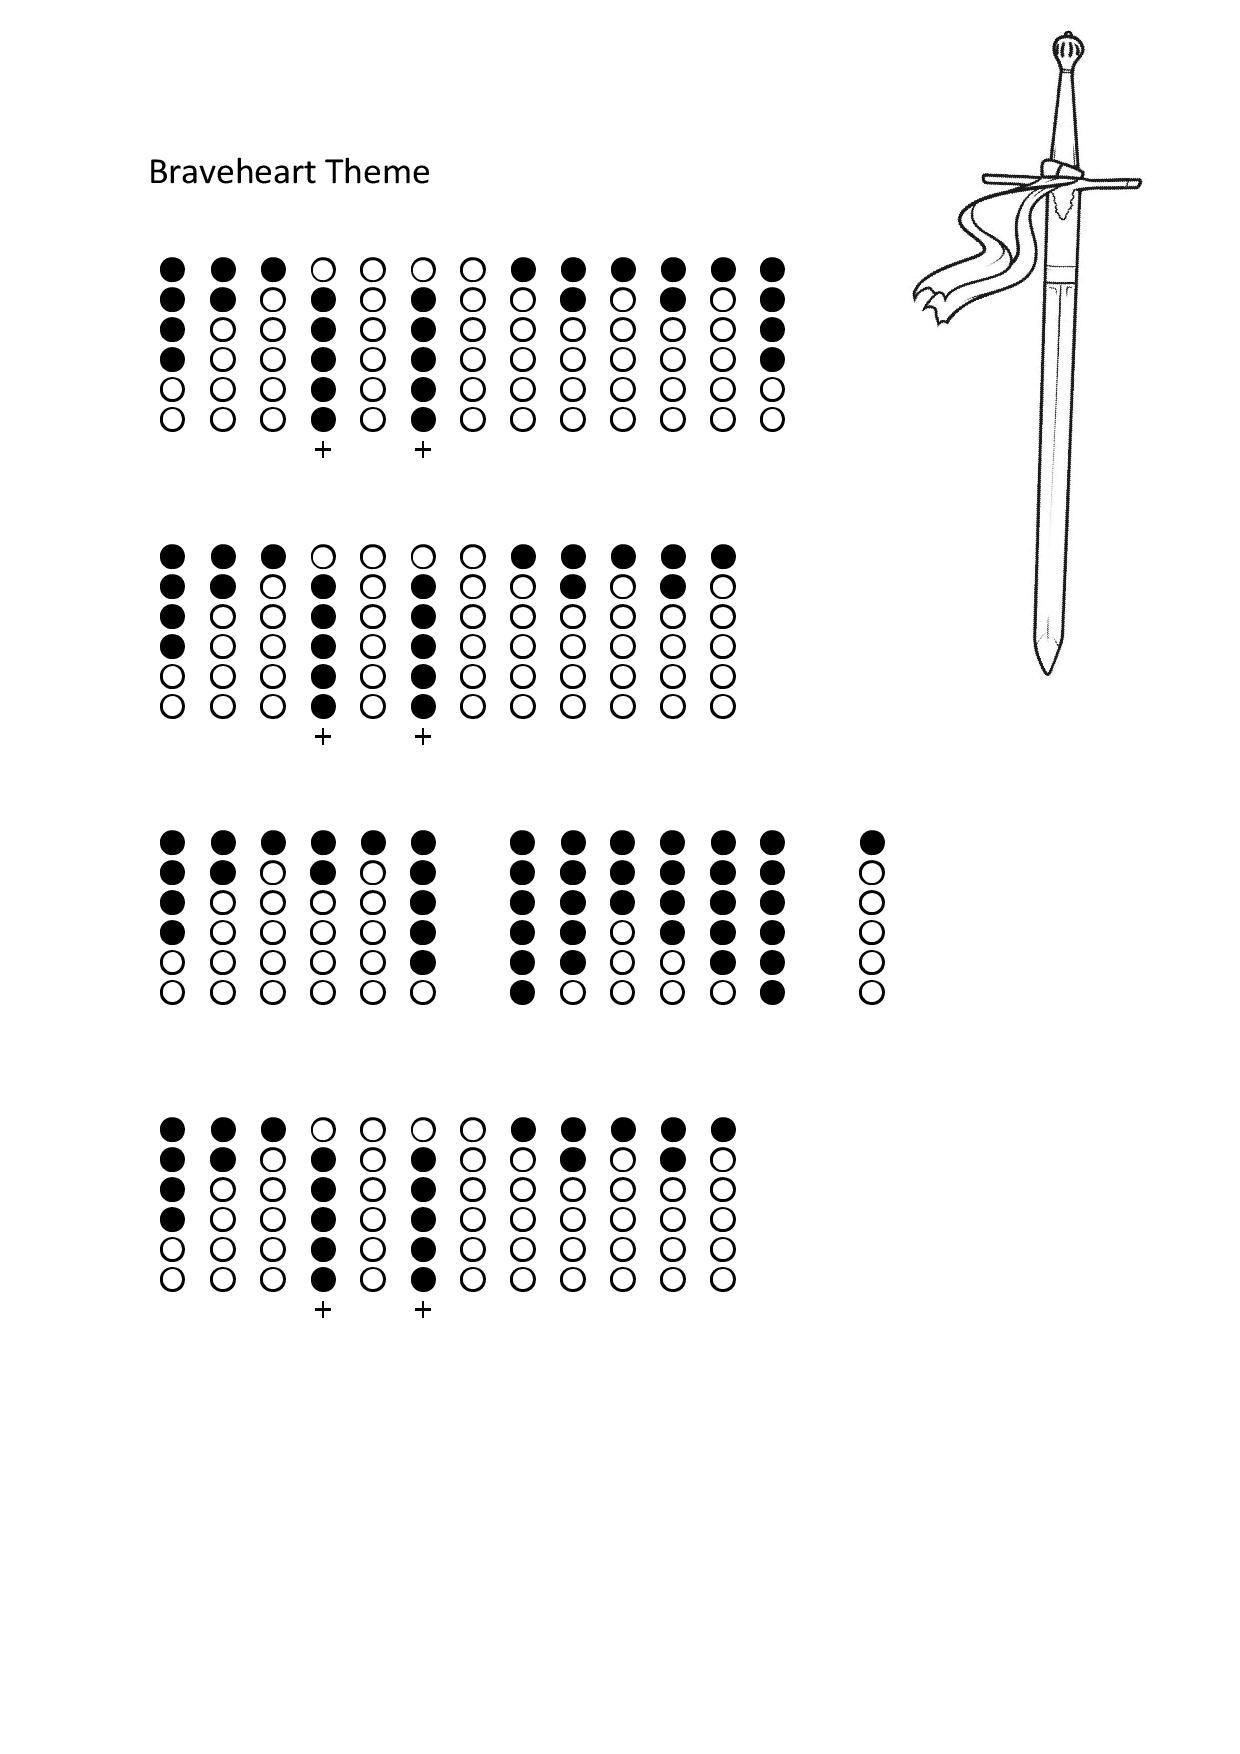 hobbit tin whistle notes wiring diagram database. Black Bedroom Furniture Sets. Home Design Ideas